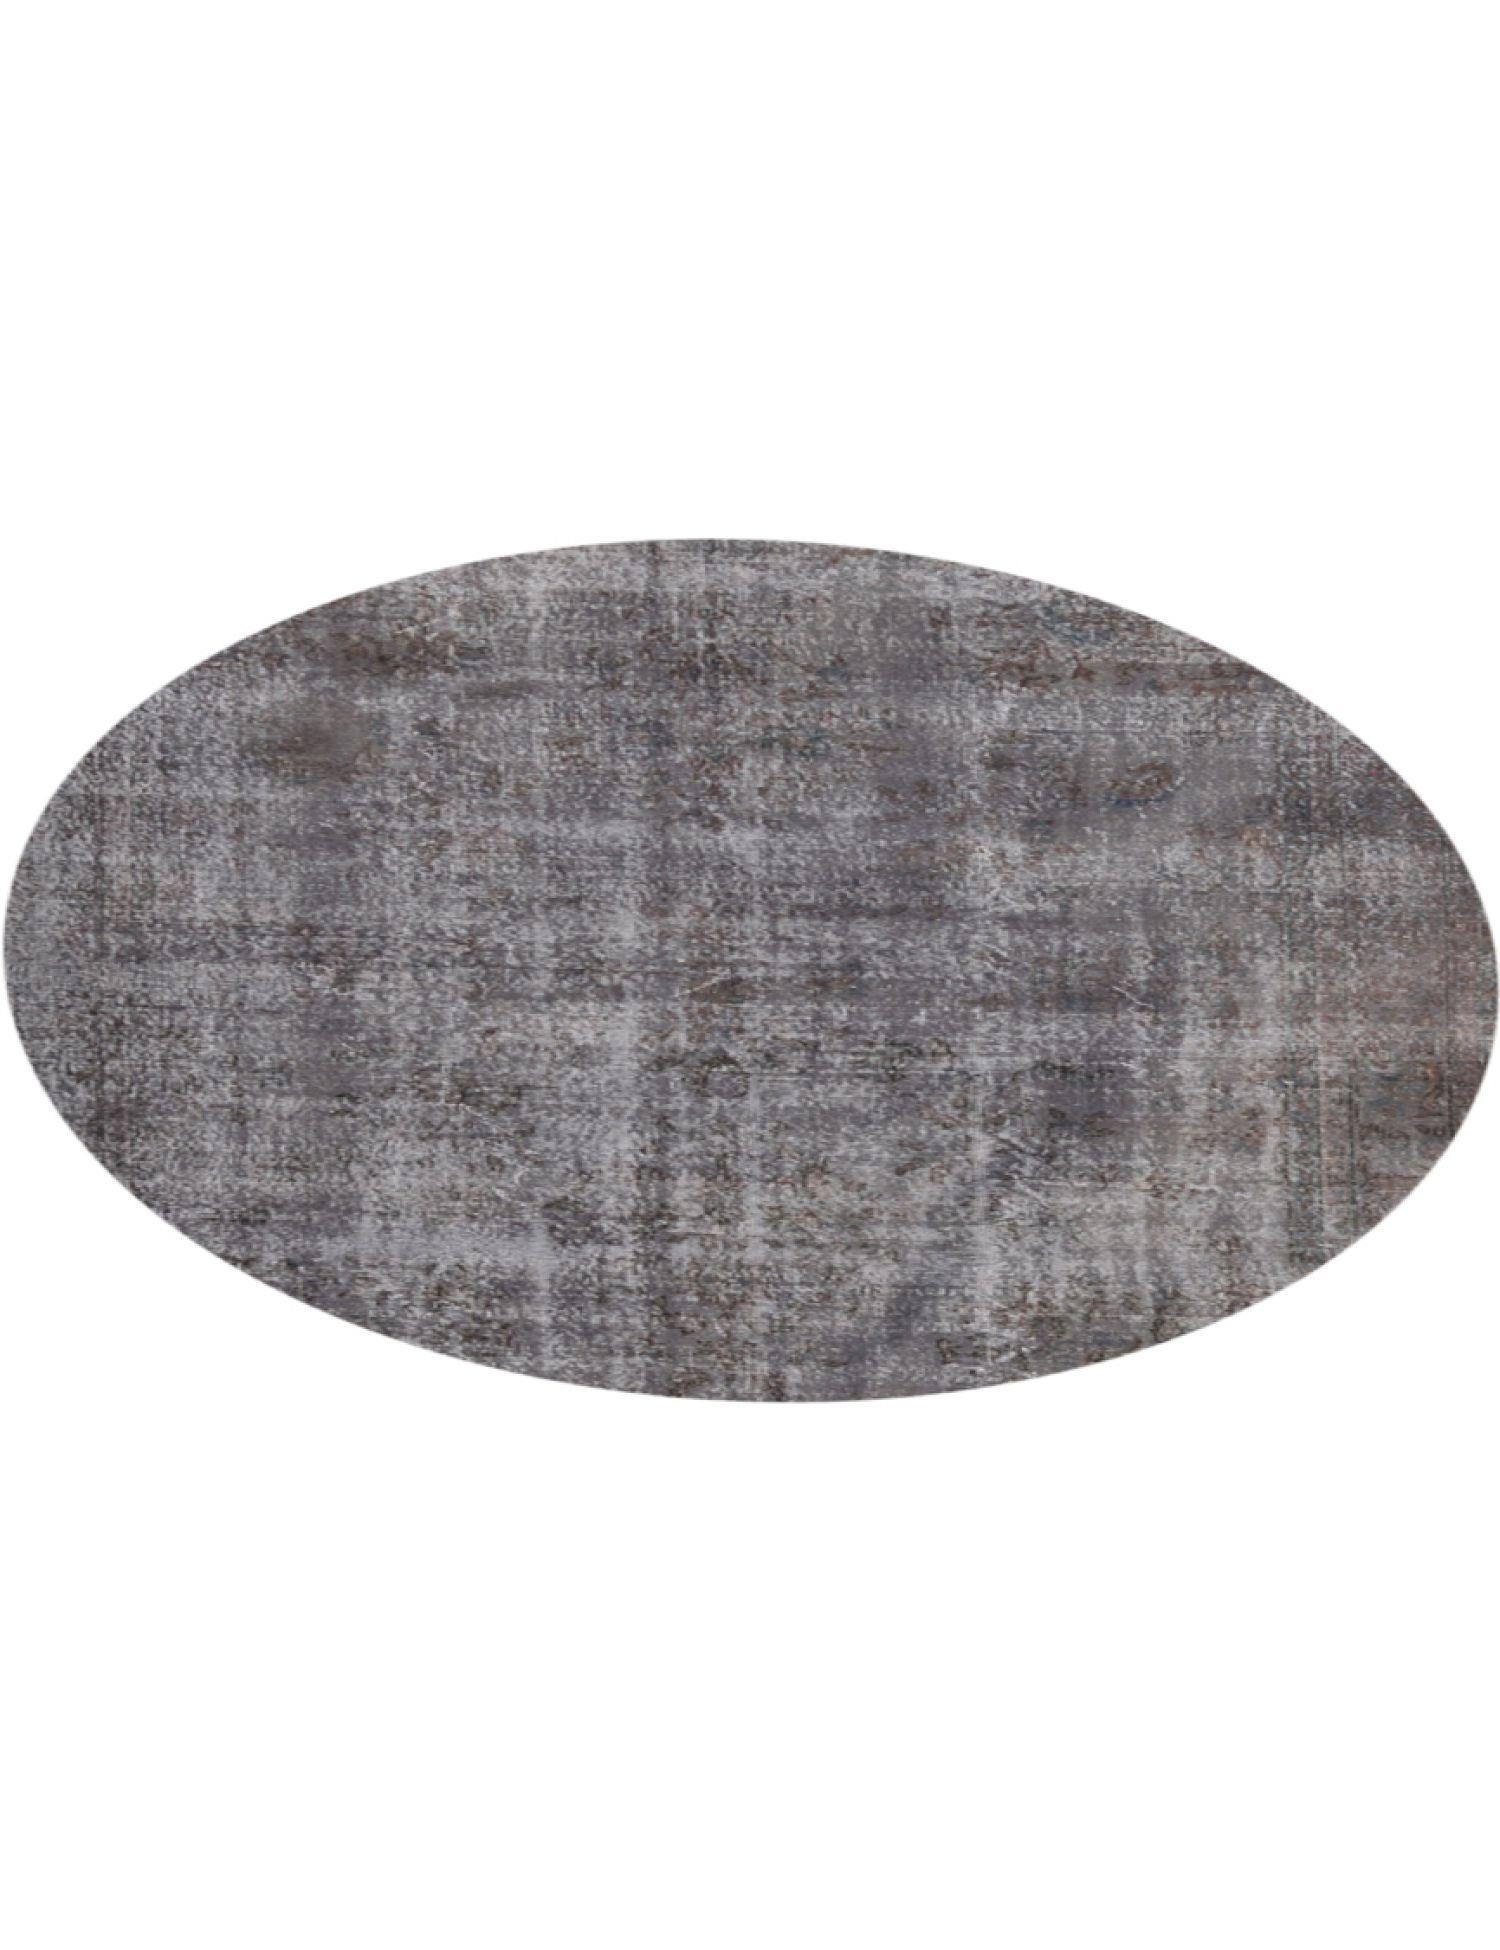 Tappeto Vintage  grigo <br/>215 x 215 cm